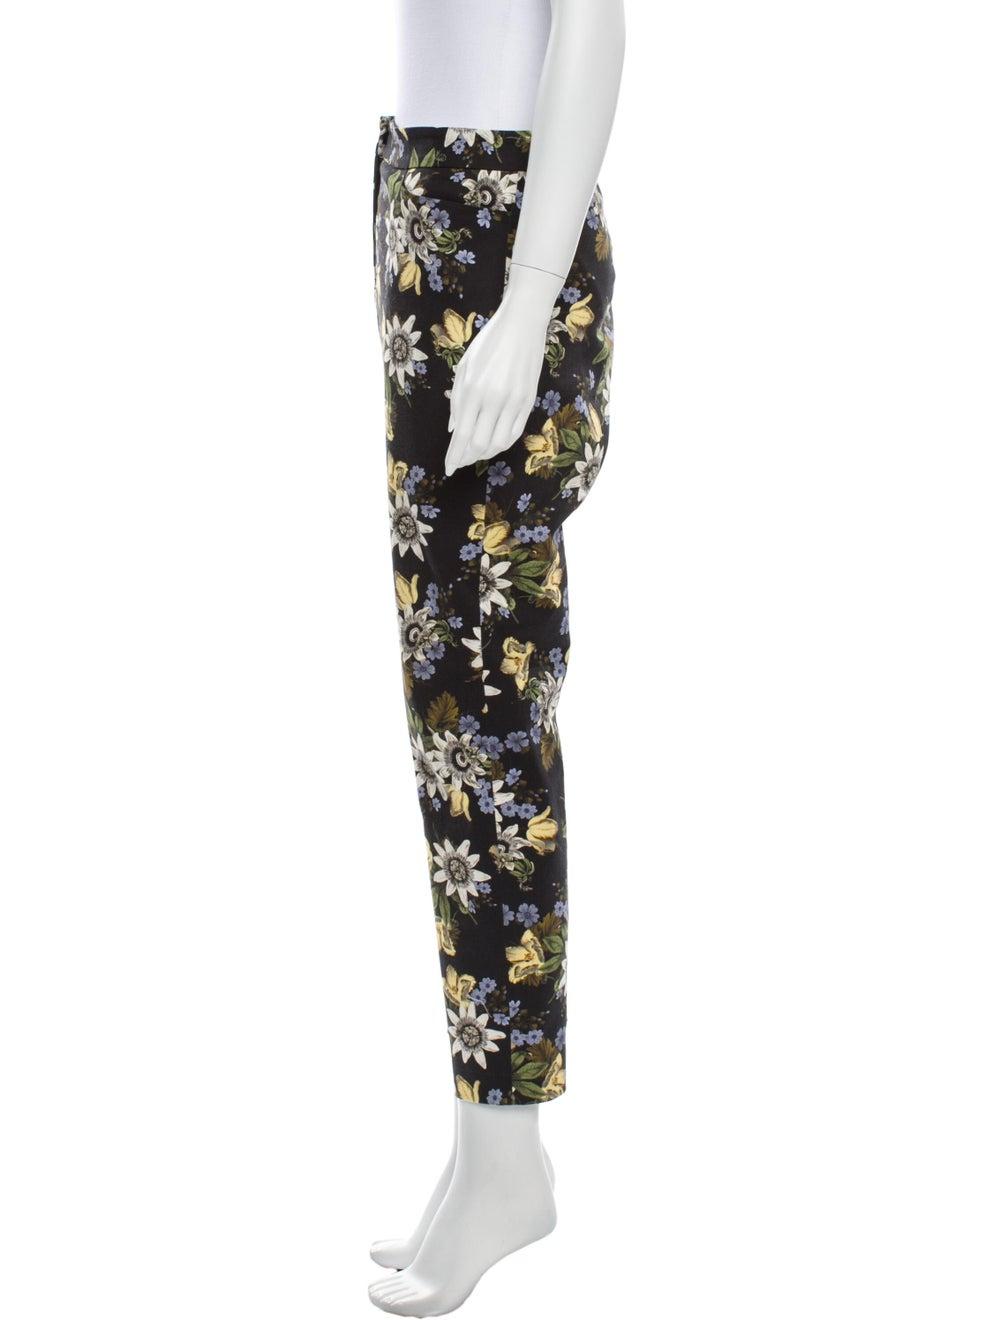 Erdem Floral Print Straight Leg Pants Black - image 2